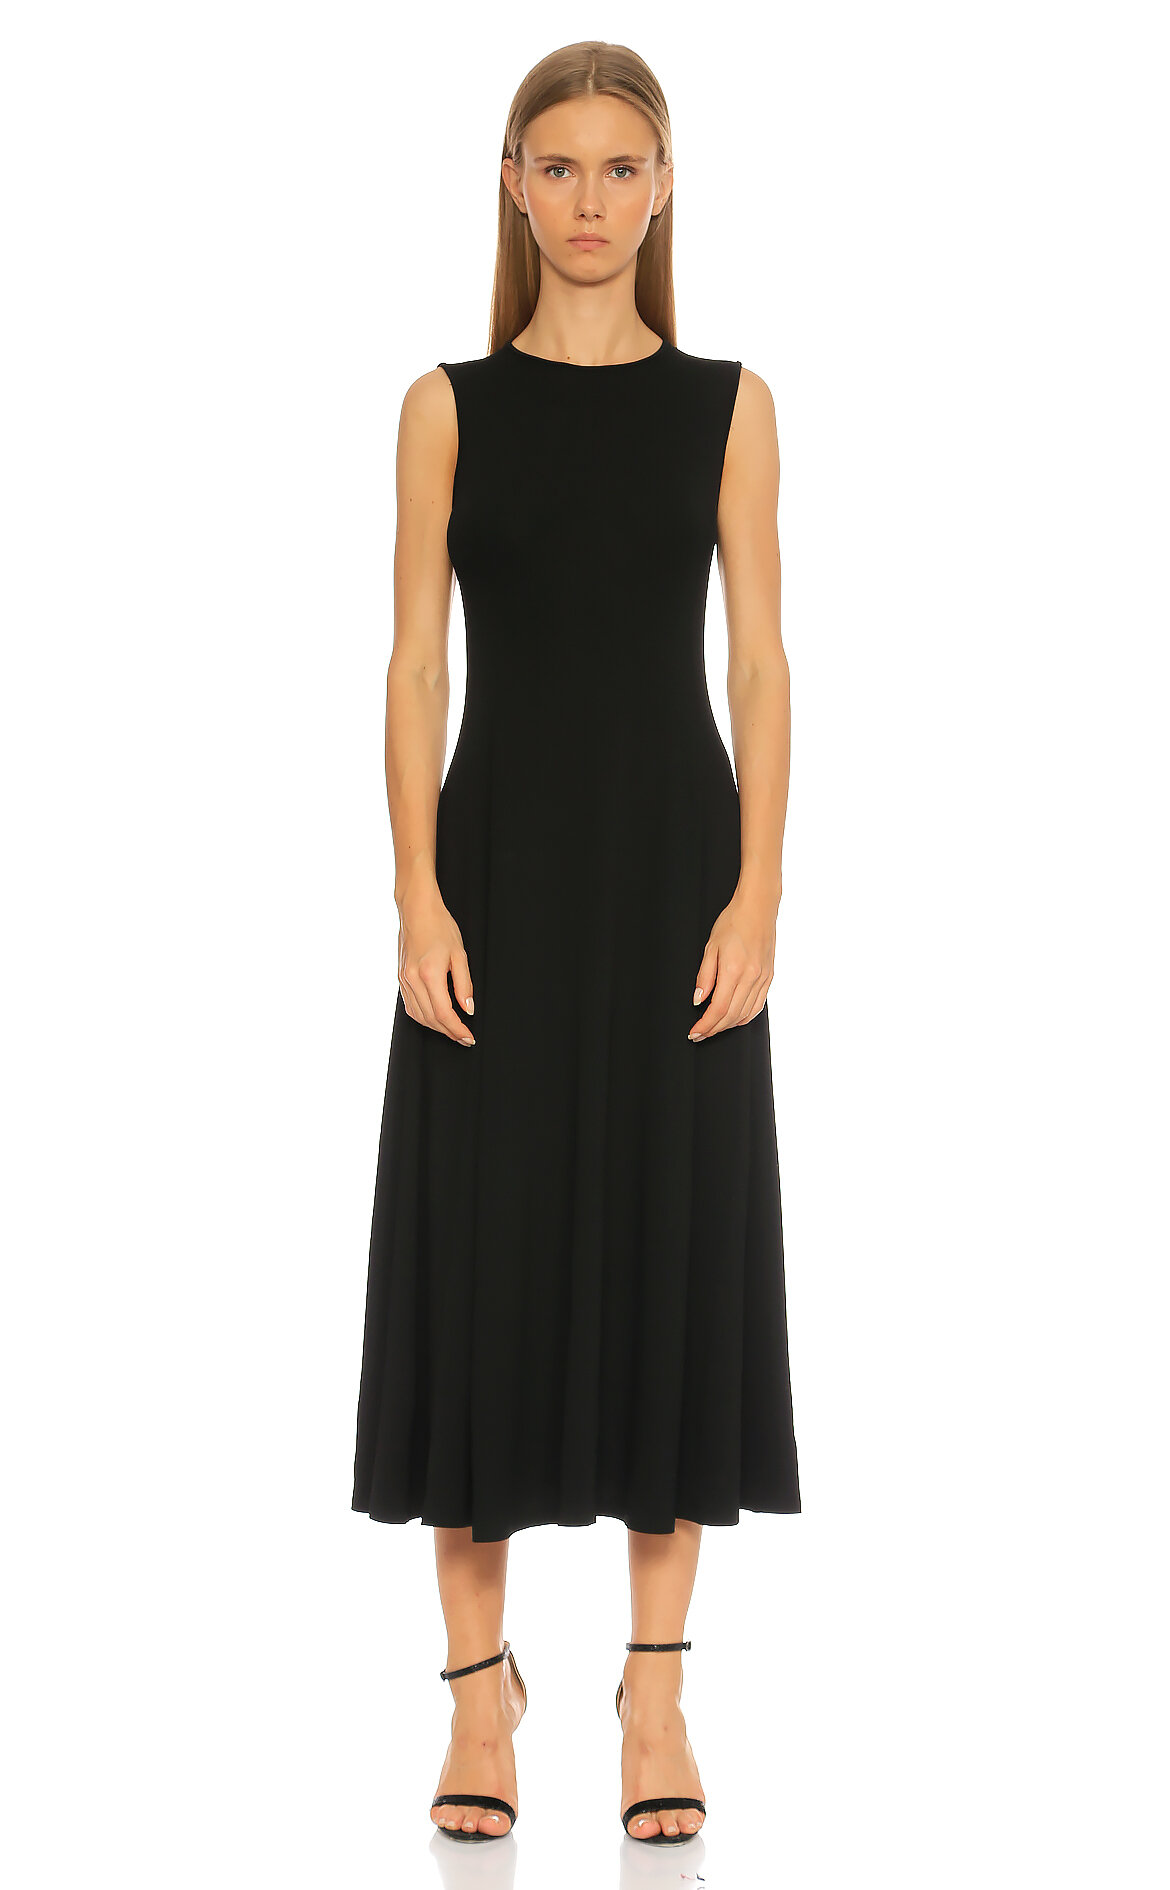 Michael Kors Collection-Michael Kors Collection Kolsuz Midi Siyah Elbise